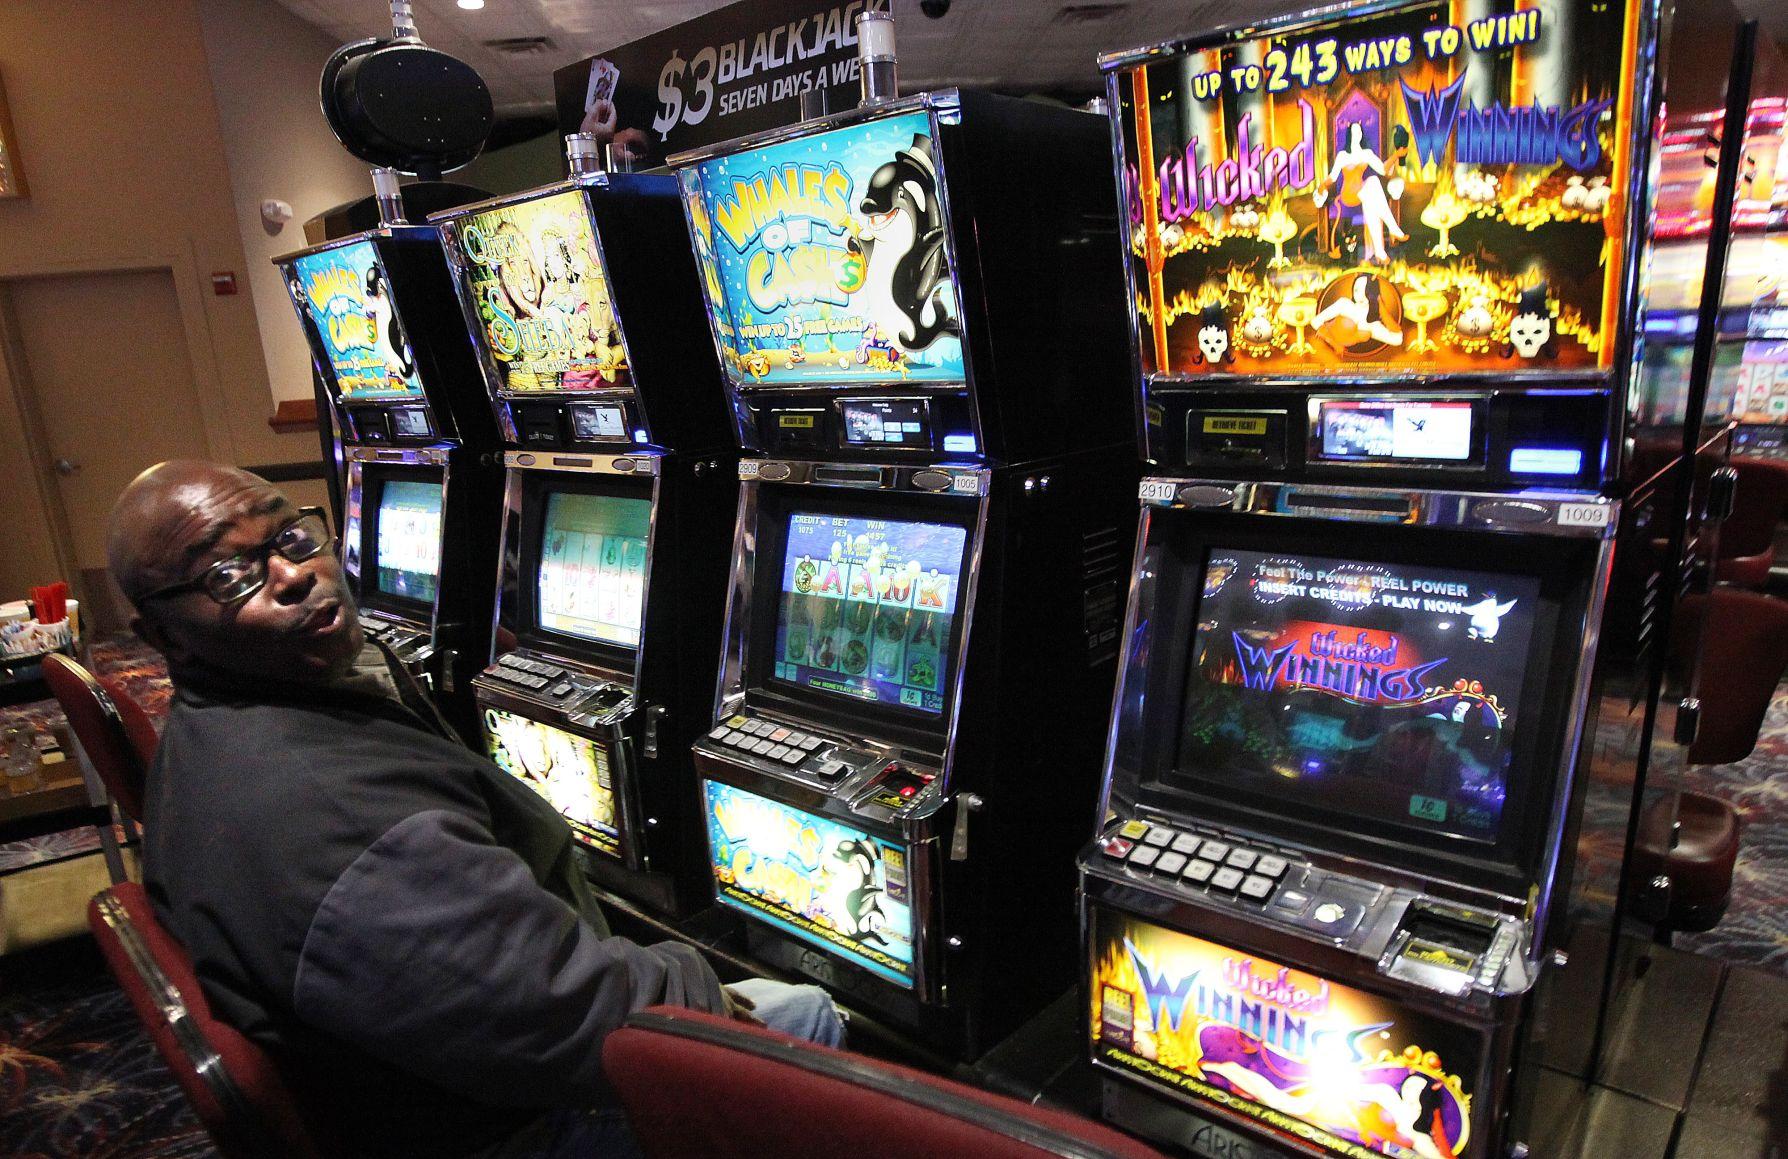 Slot machine casinos in bakersfield montiego bay casino windover